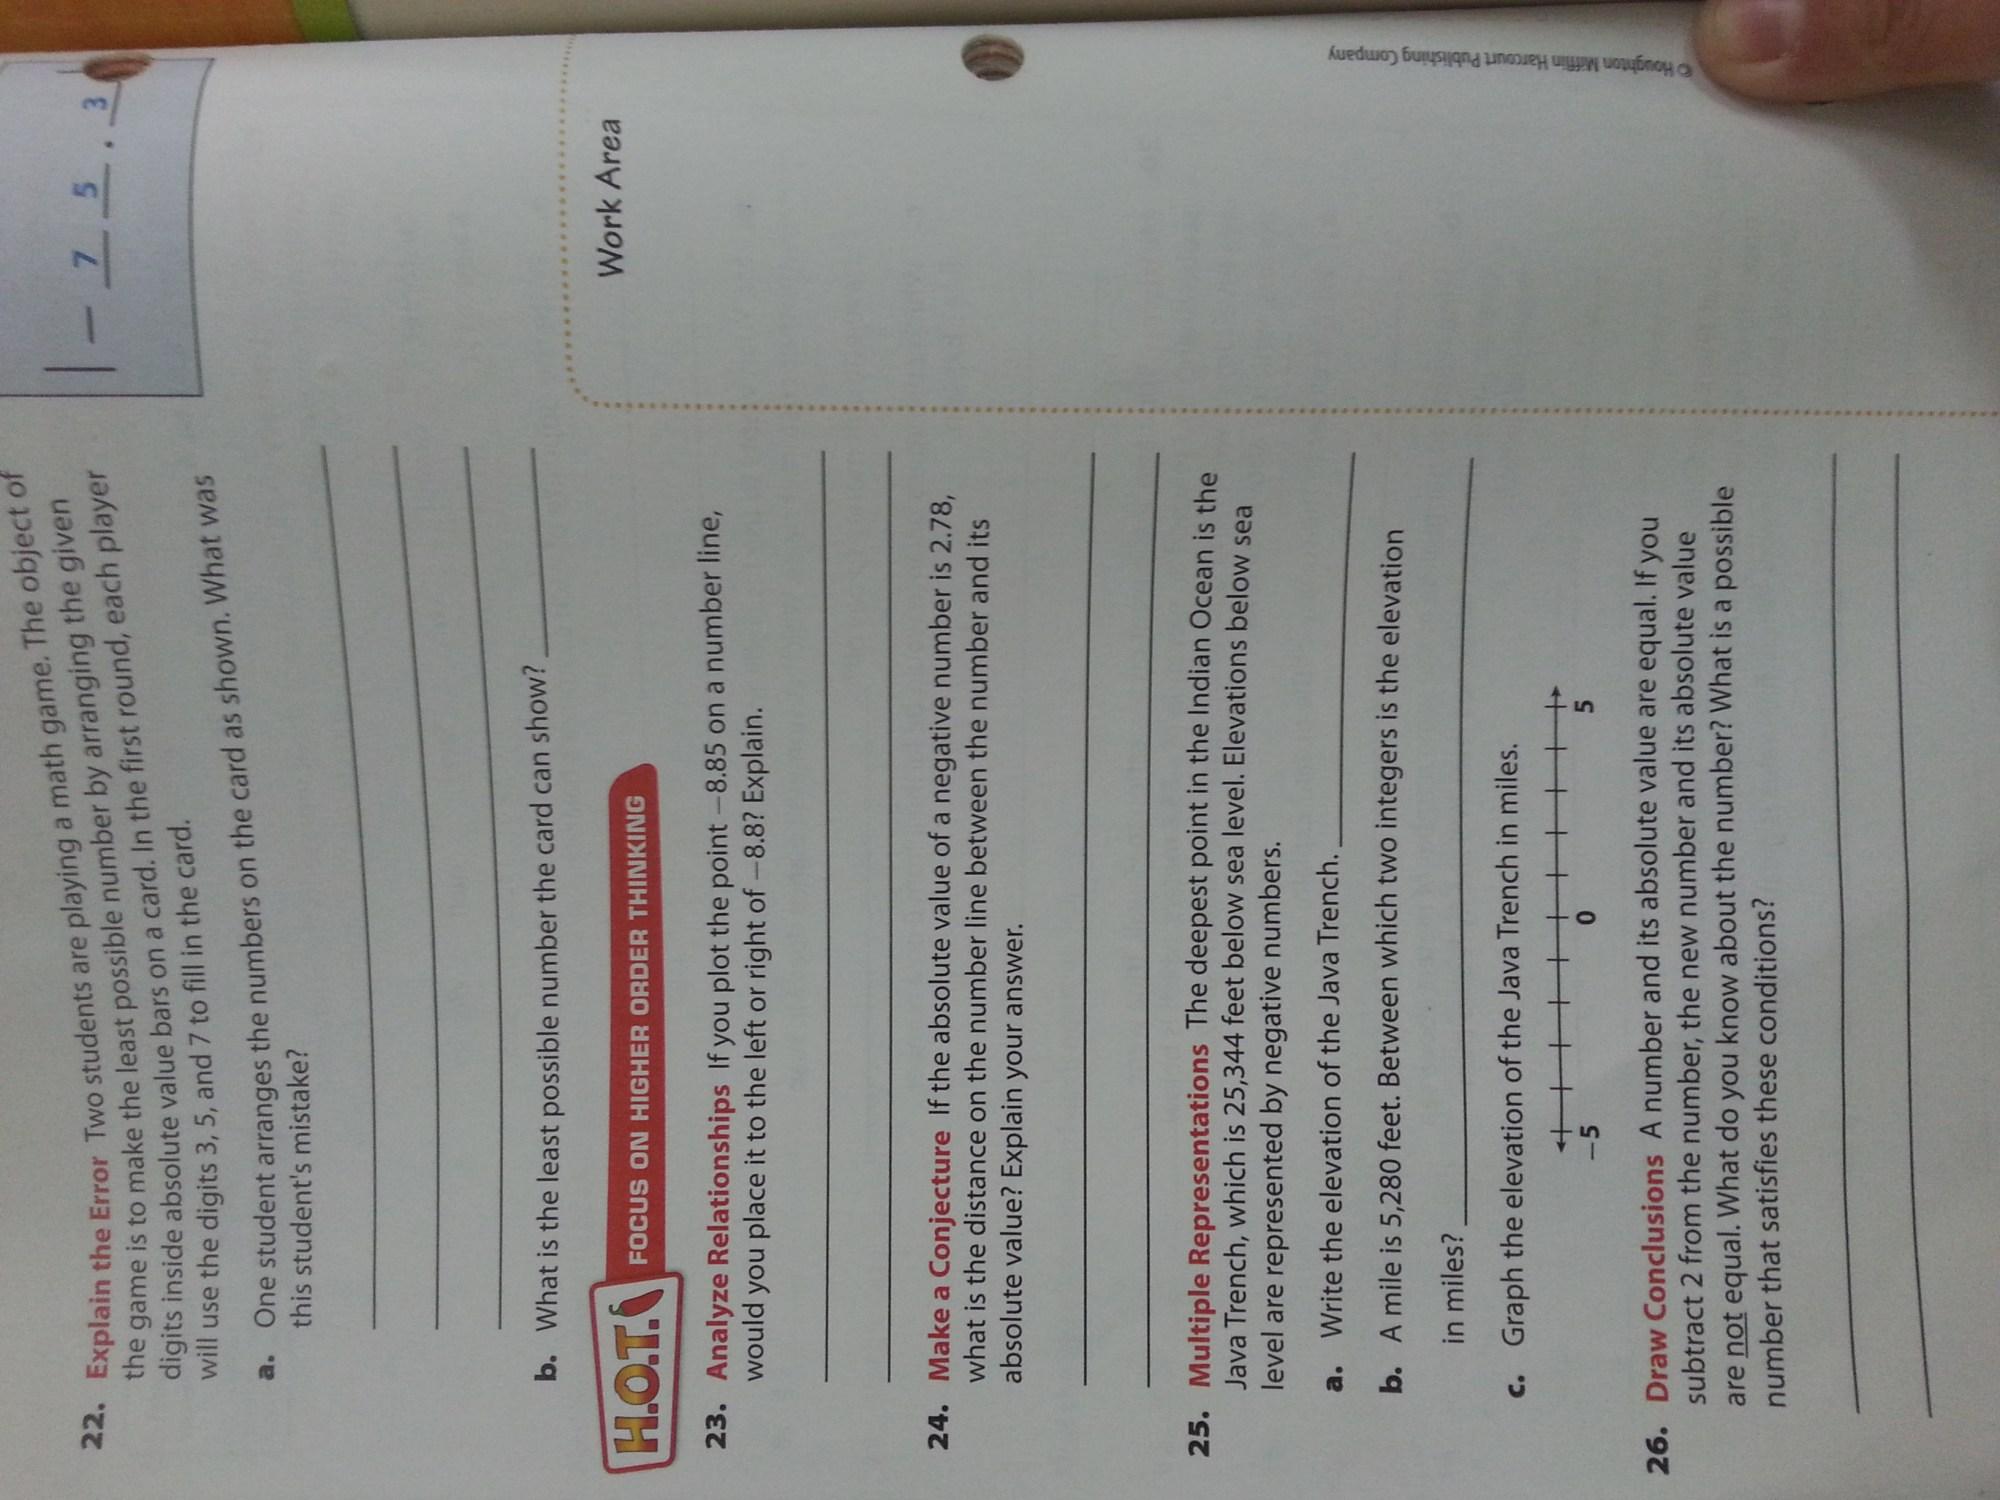 hight resolution of Go math 7th grade homework help projects.make-web.org › Go math 7th grade  homework help Go math 7th grade homework help Rated 5 stars